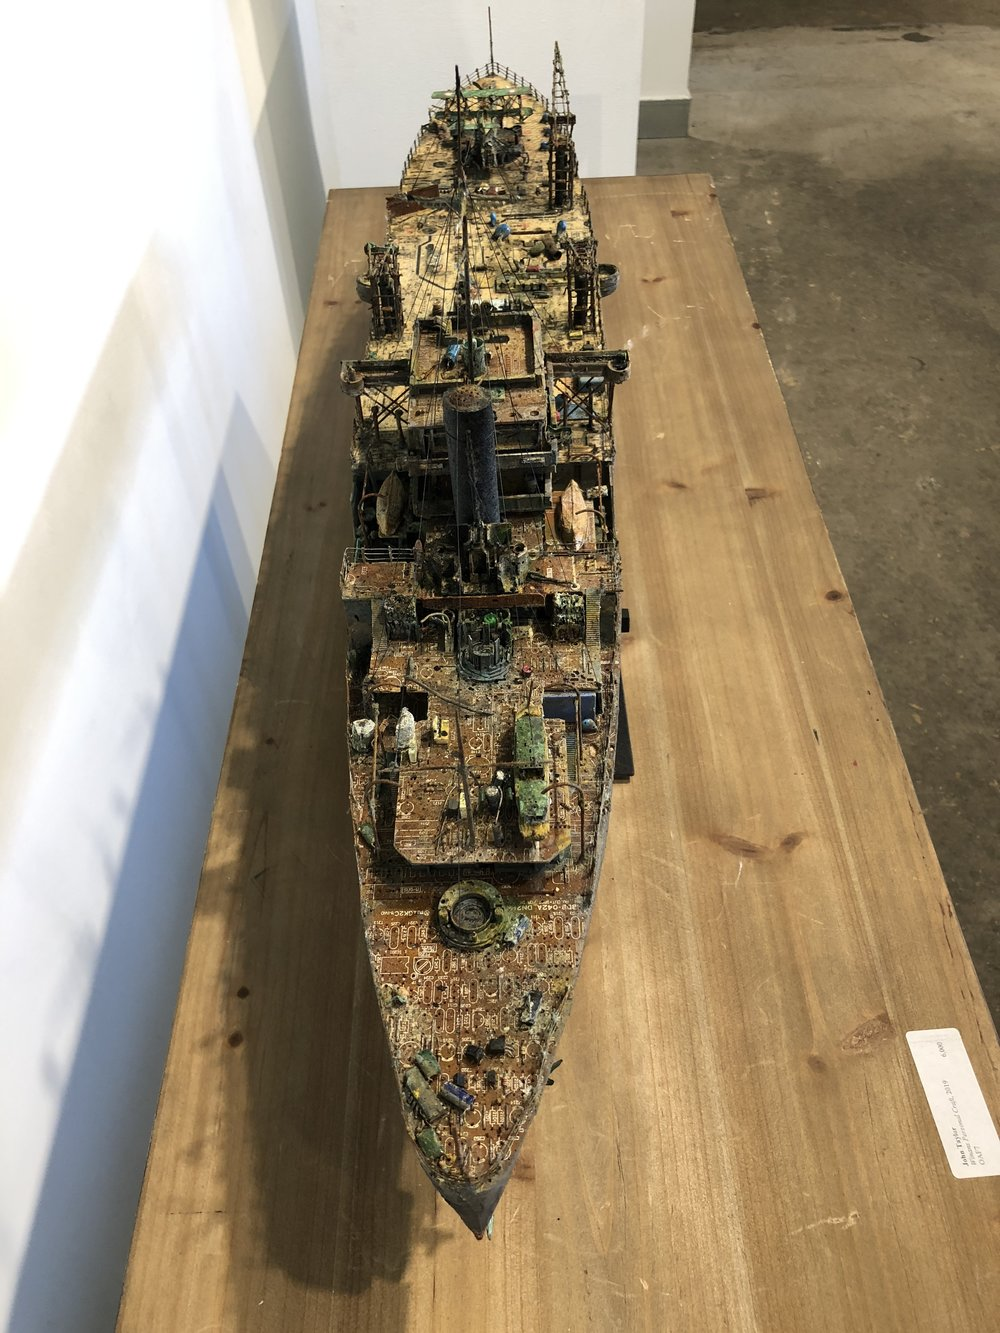 HMAS Albatross (detail)